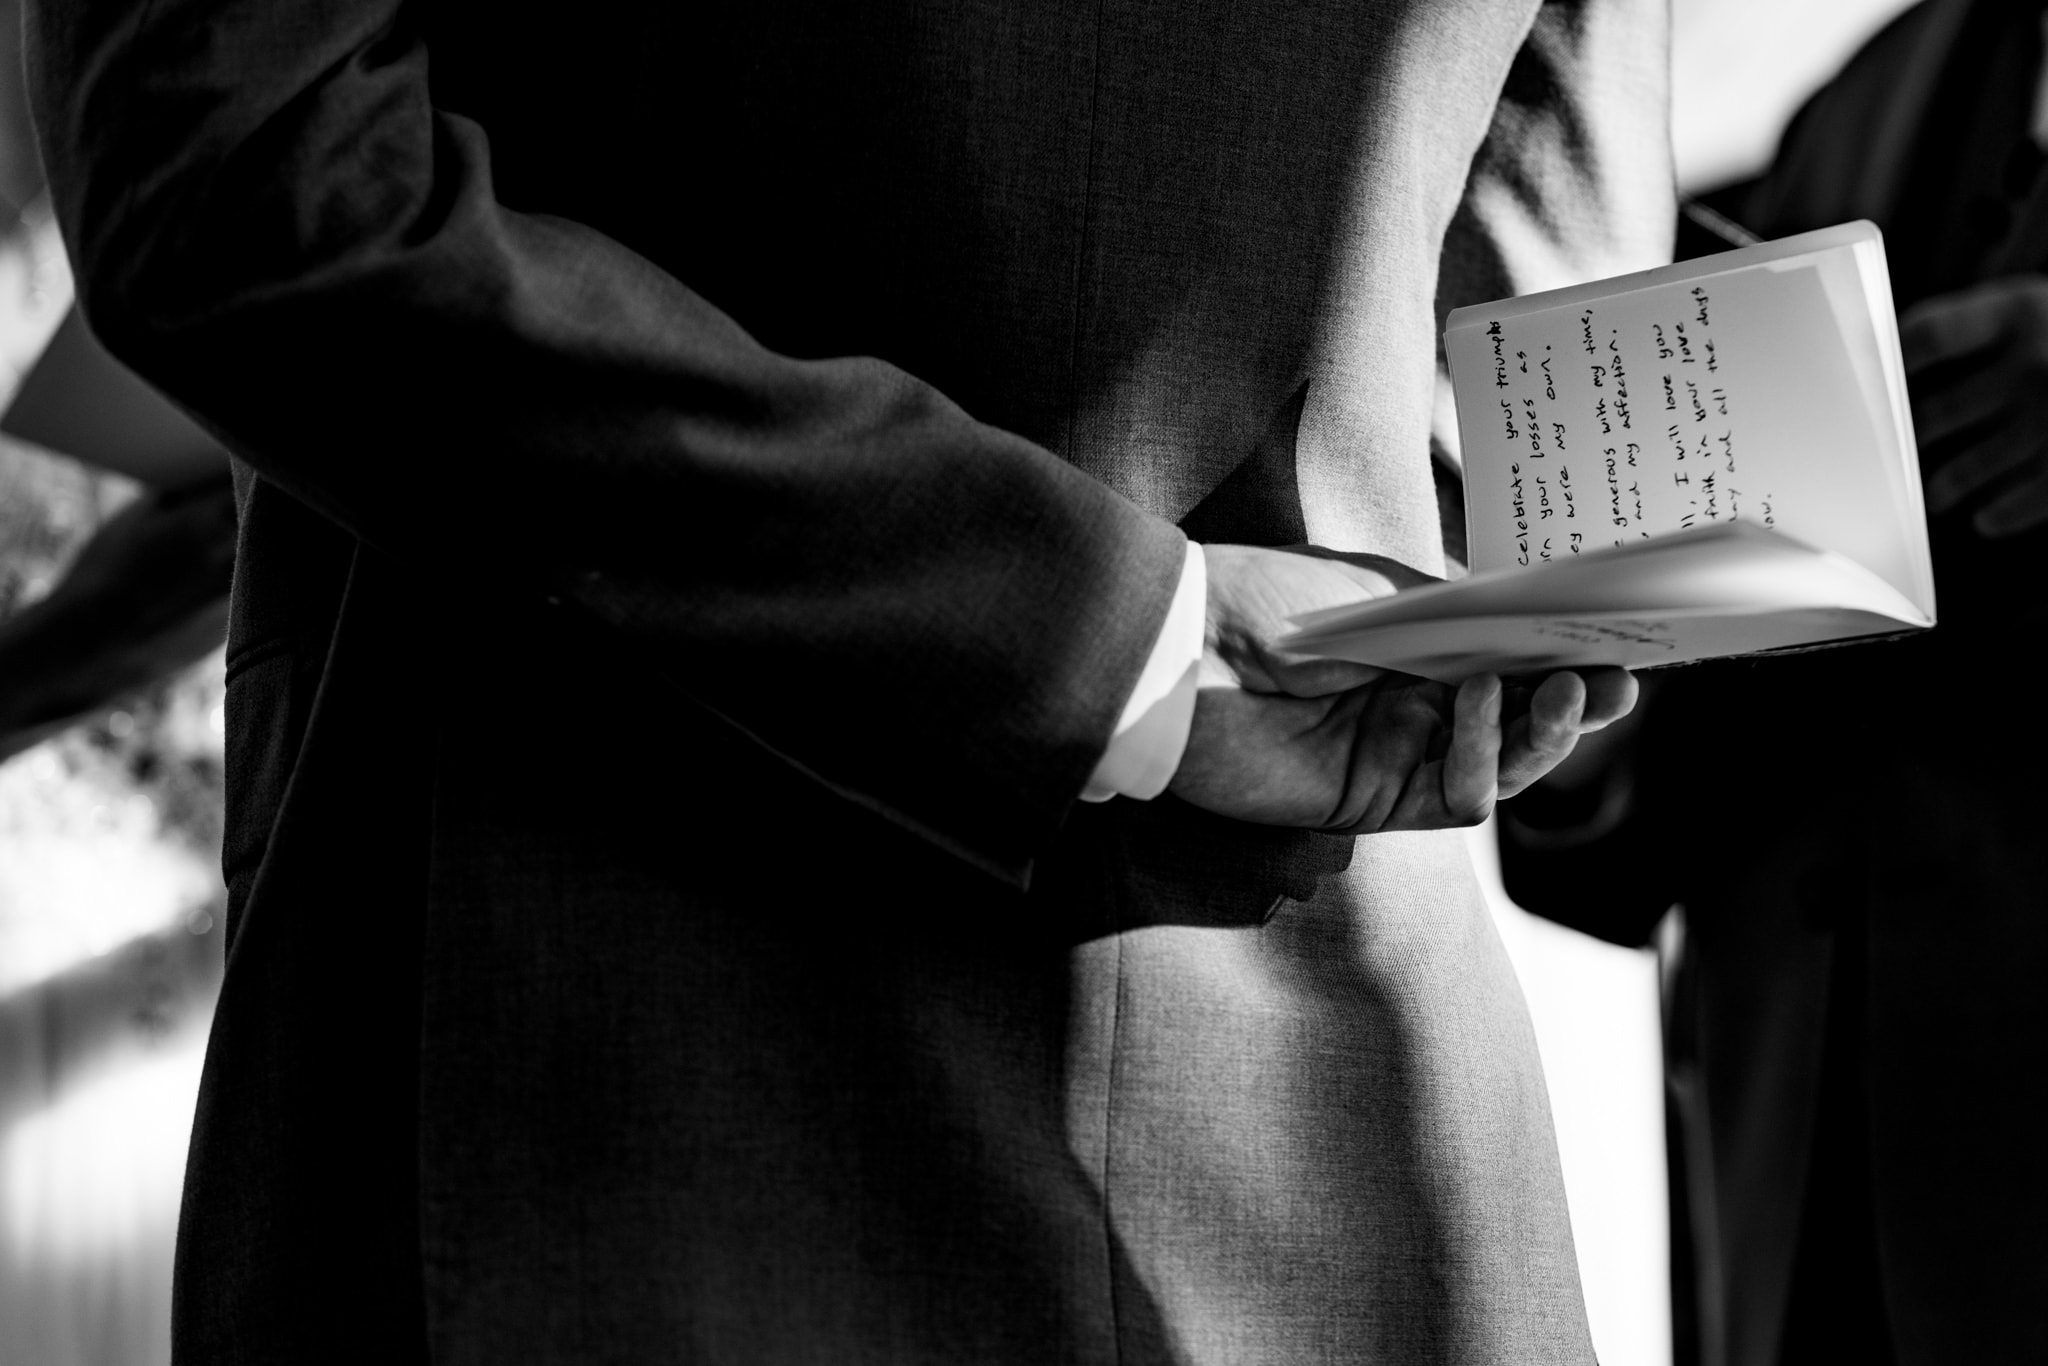 Groom holds wedding vows behind his back